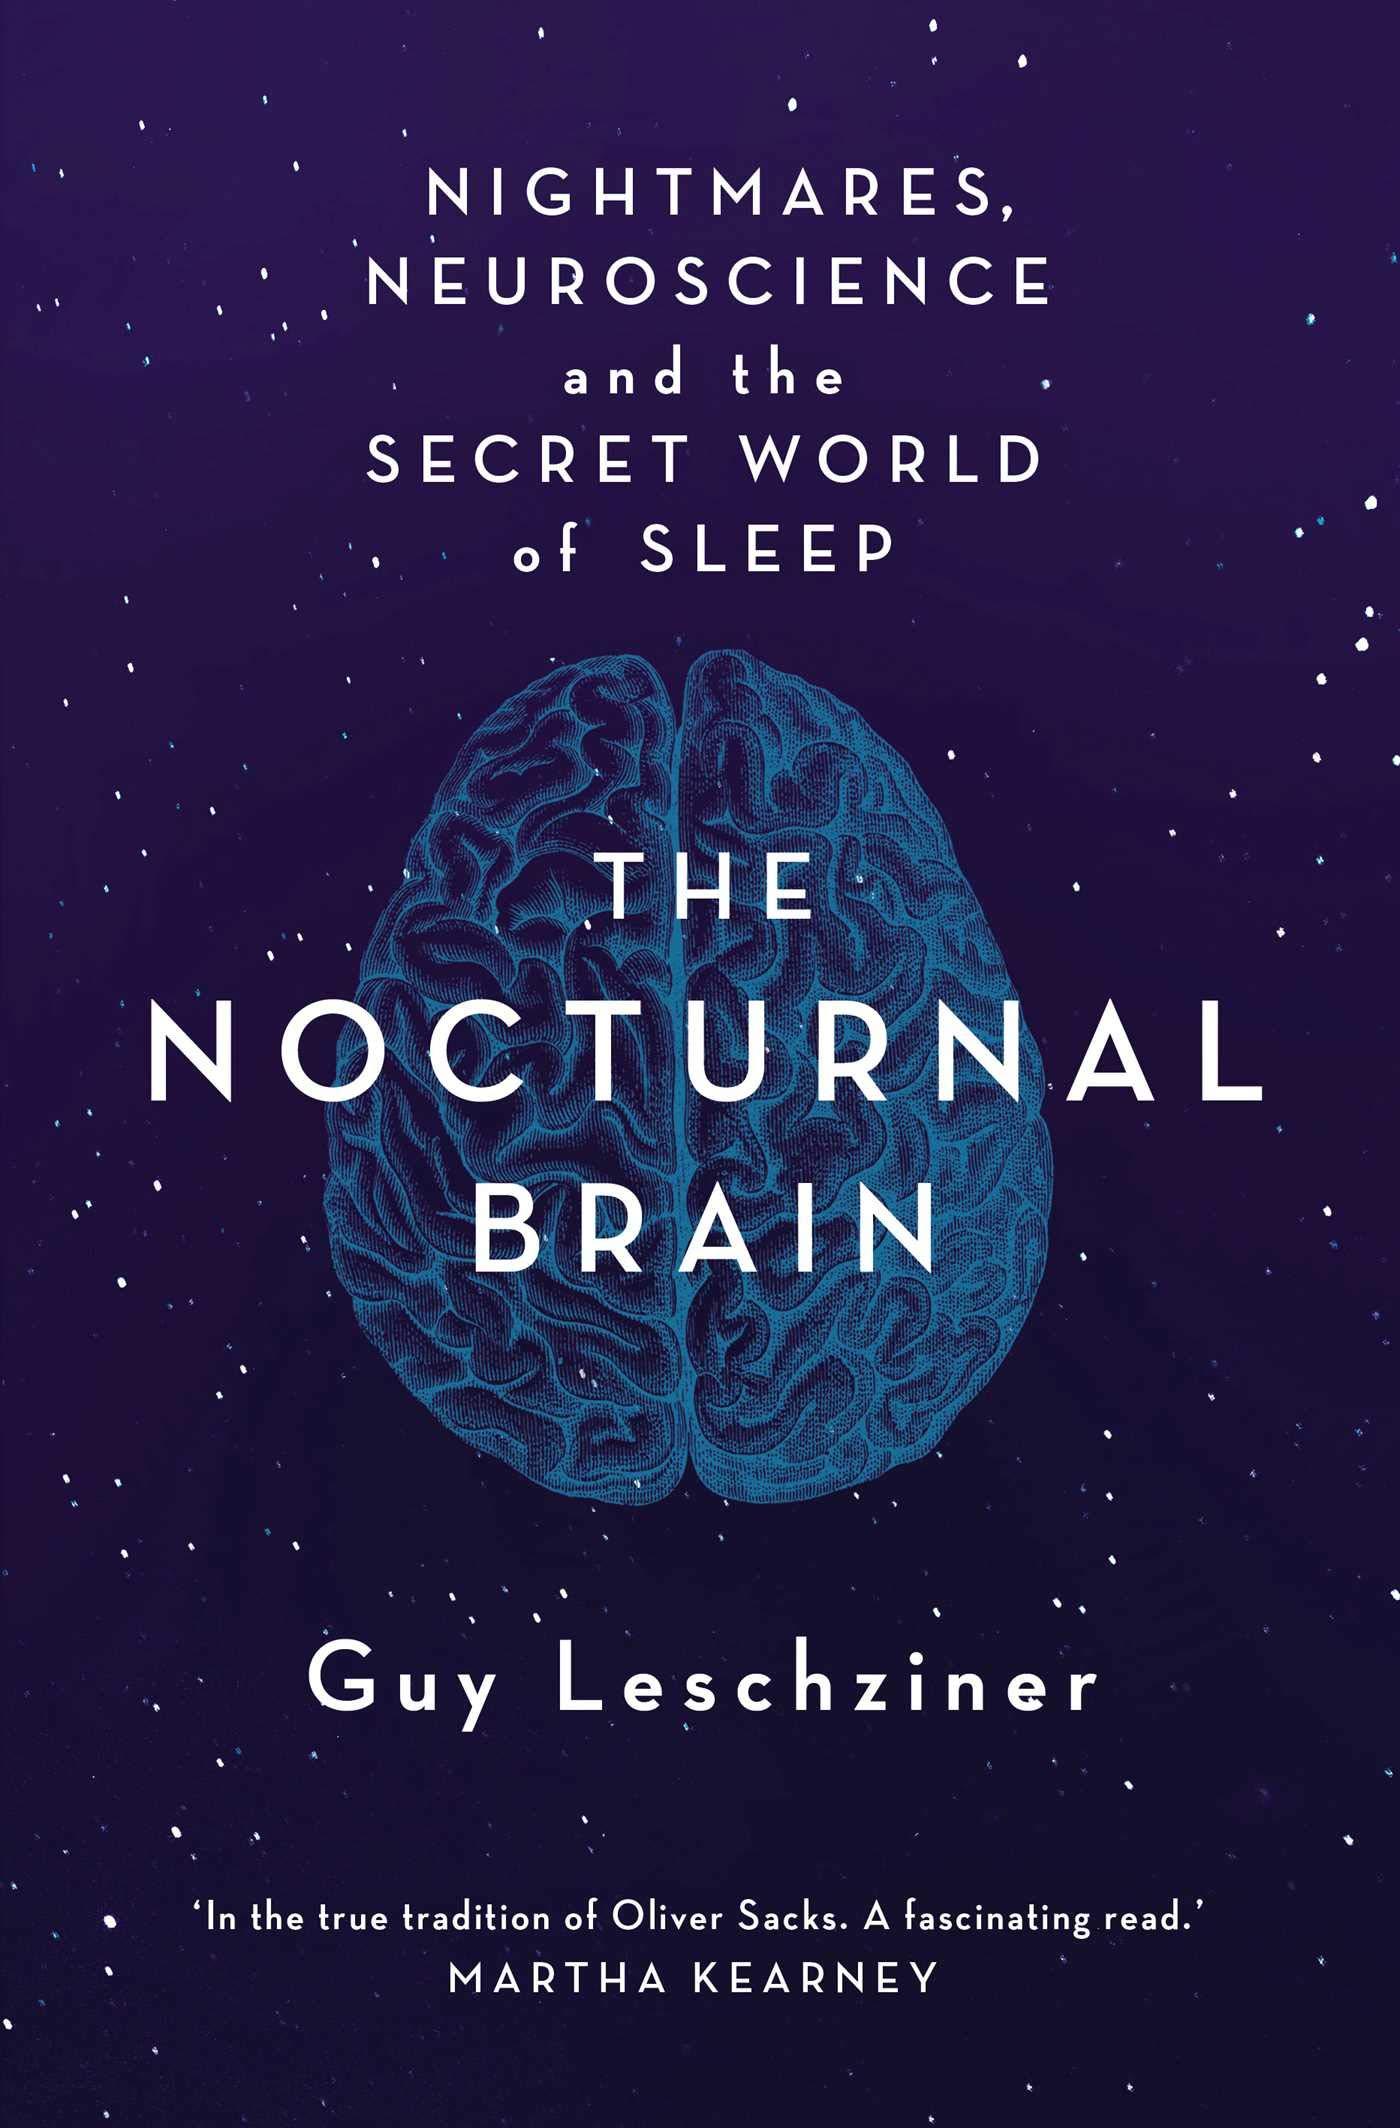 The Nocturnal Brain.jpg